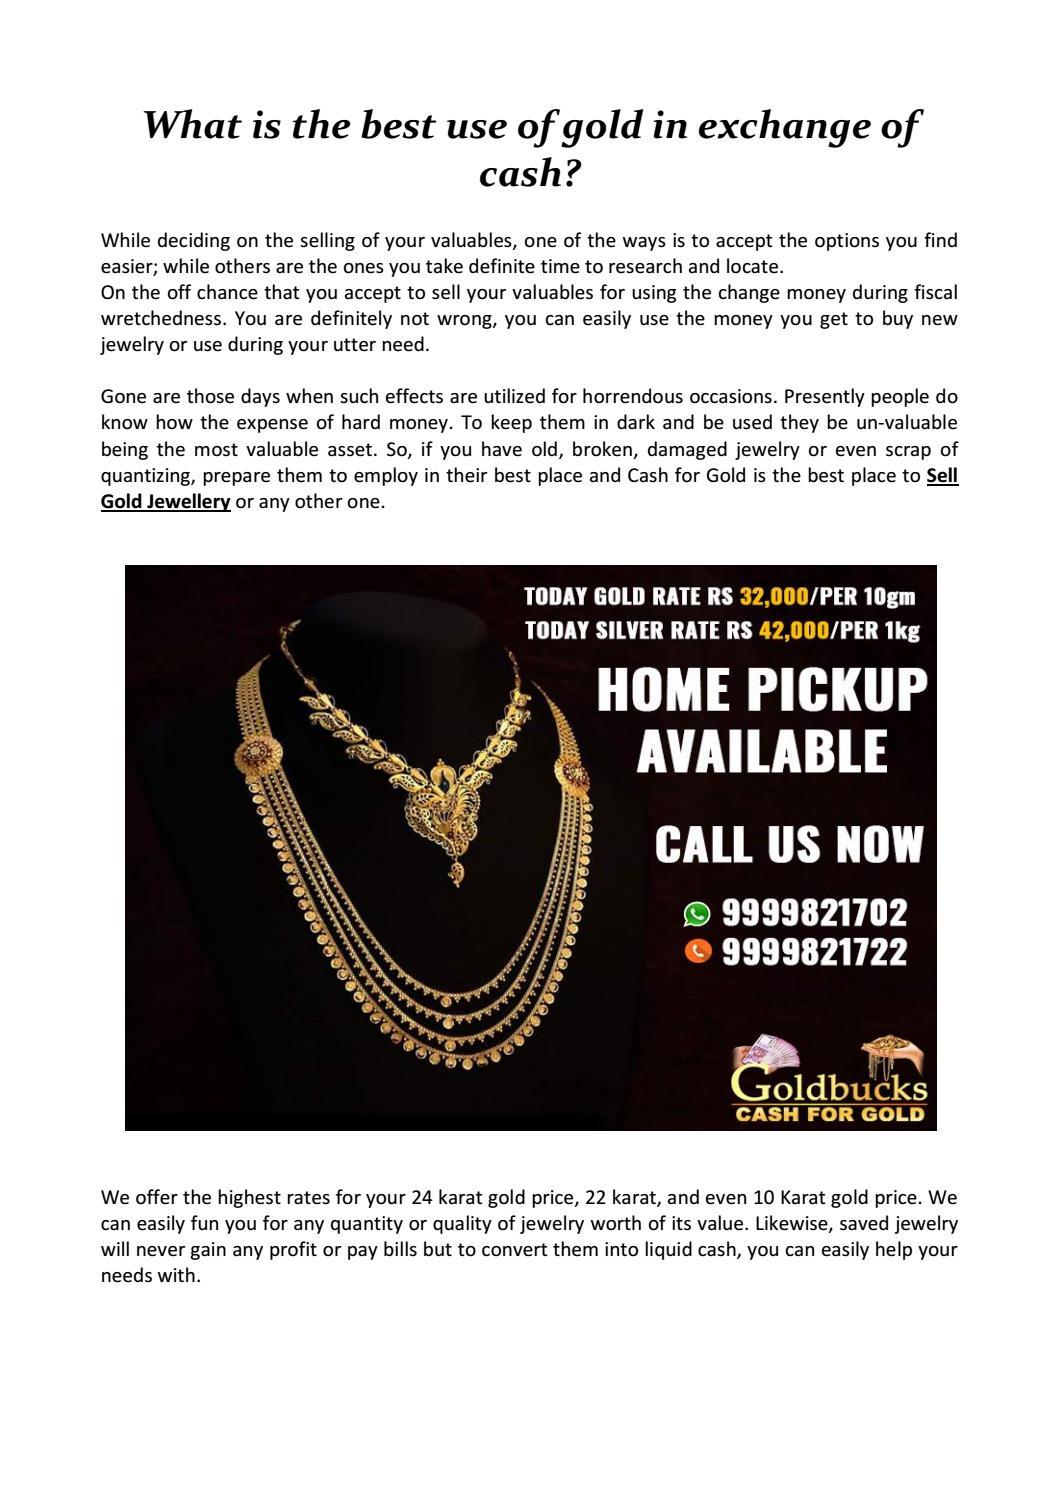 Gold In Exchange Of Cash By Cashforgold